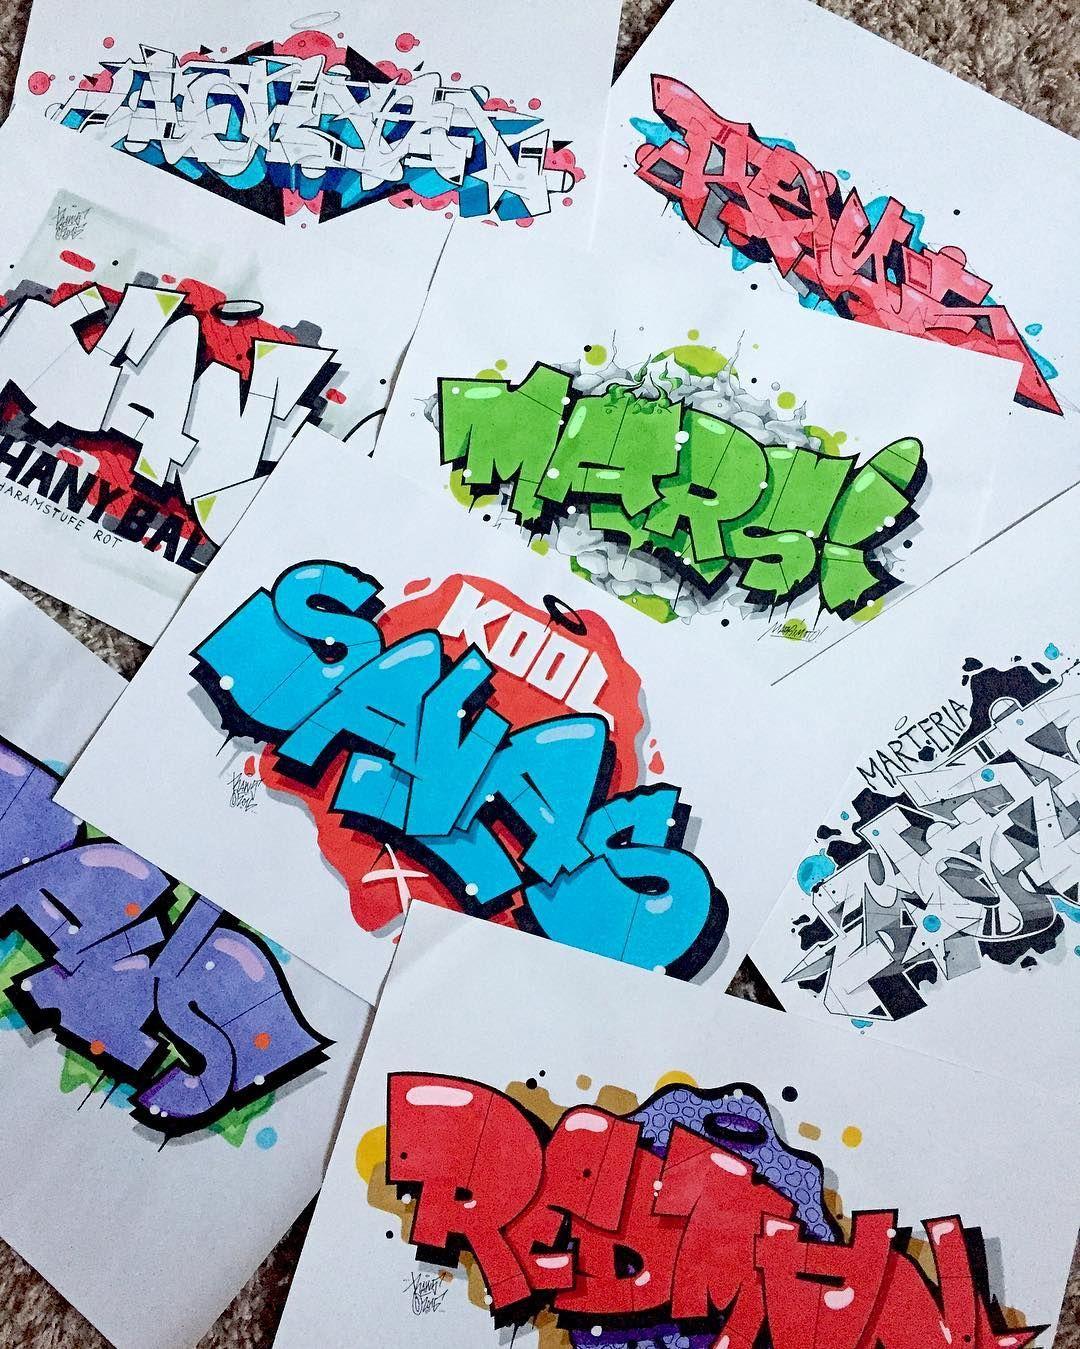 Pin by kevin on graffiti letras graffiti grafiti graffitis letras